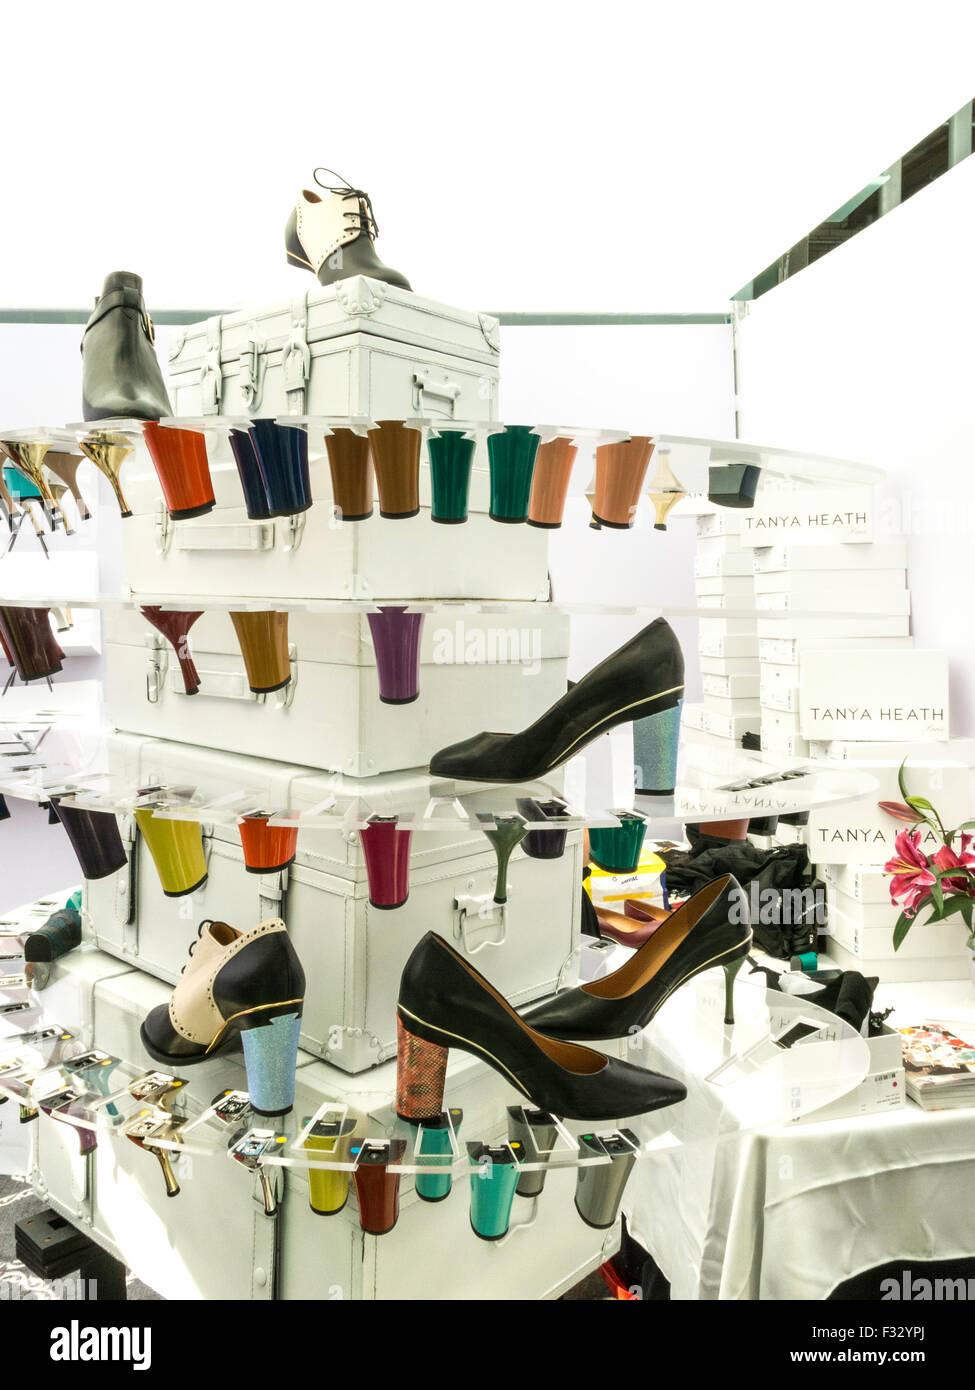 c391131f5e5 Tanya Heath High Heel Shoe Booth, Best of France 2015 Street Fair ...